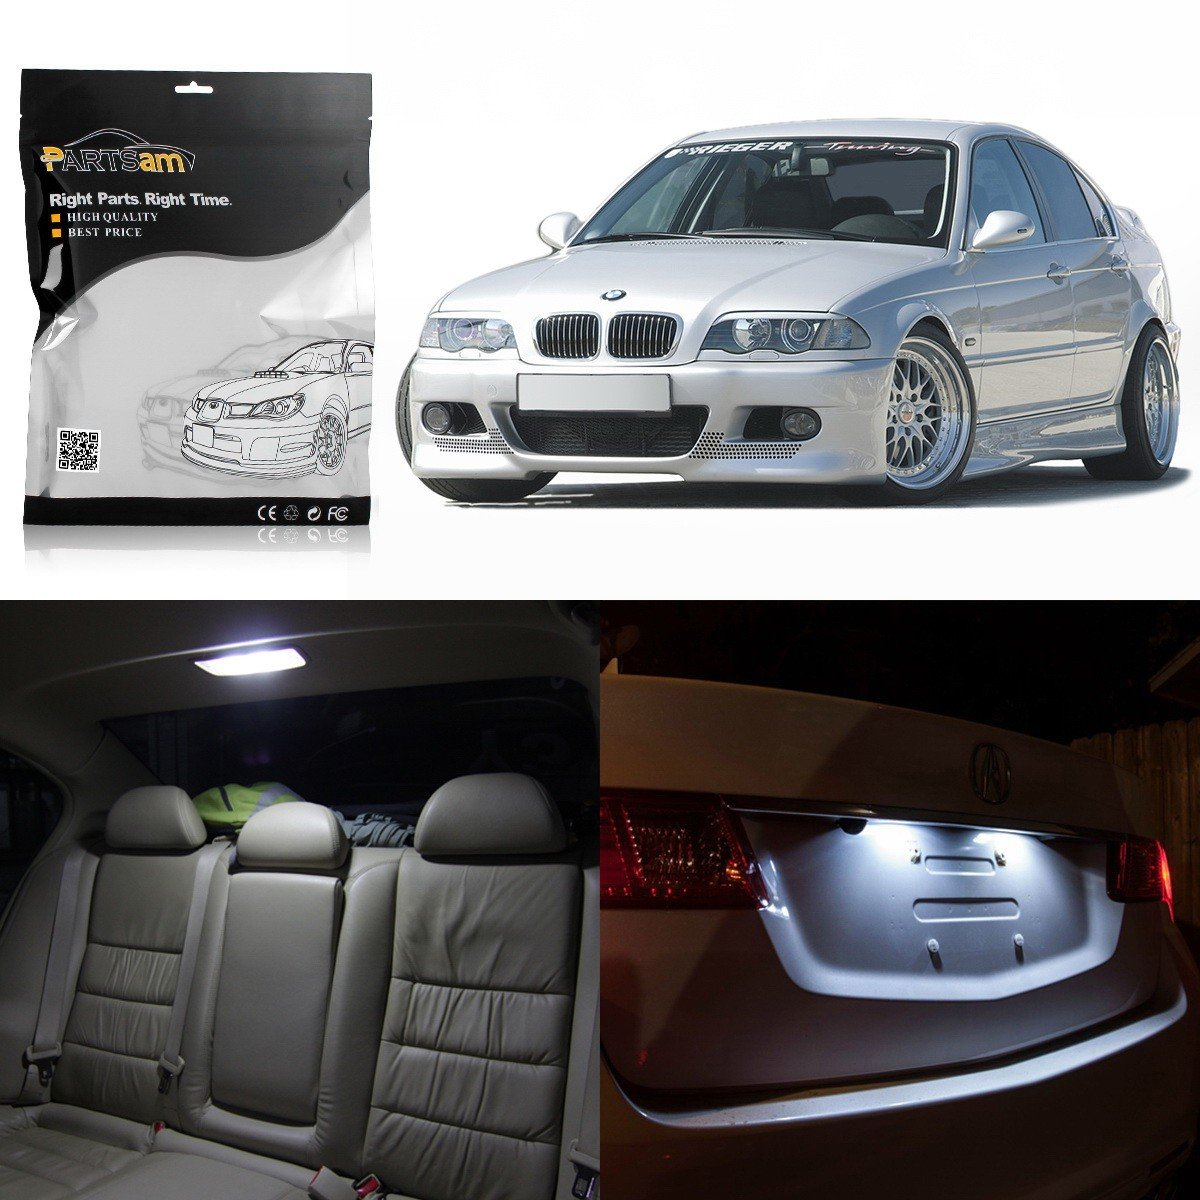 Partsam 1999 2005 Bmw E46 Sedan Wagon Coupe White Interior Led Light Package Kit 16 Pieces